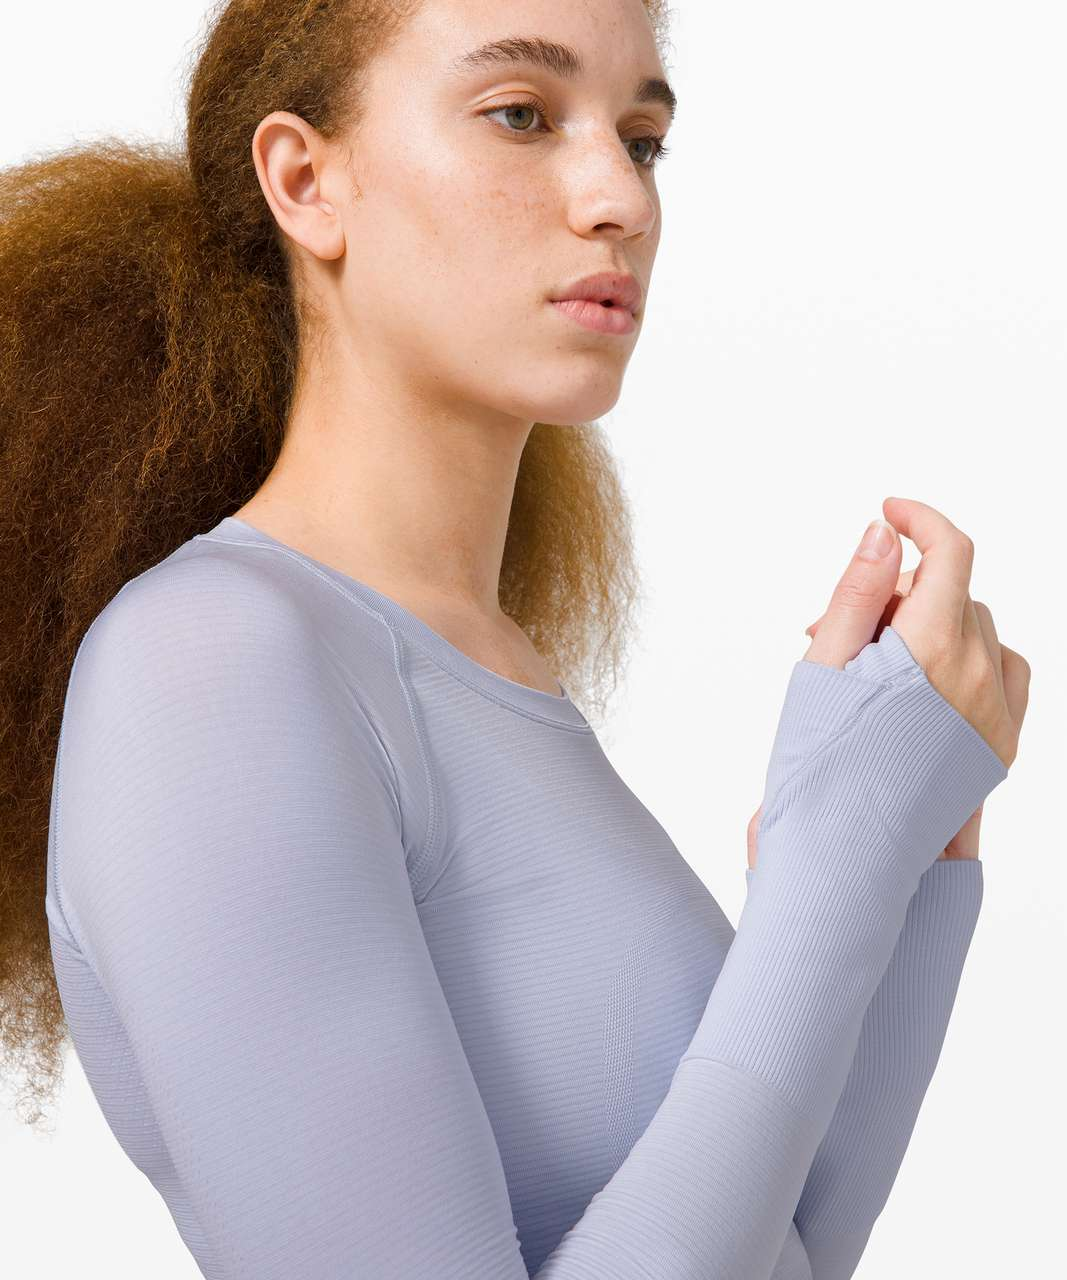 Lululemon Swiftly Tech Long Sleeve 2.0 - Serene Blue / Serene Blue